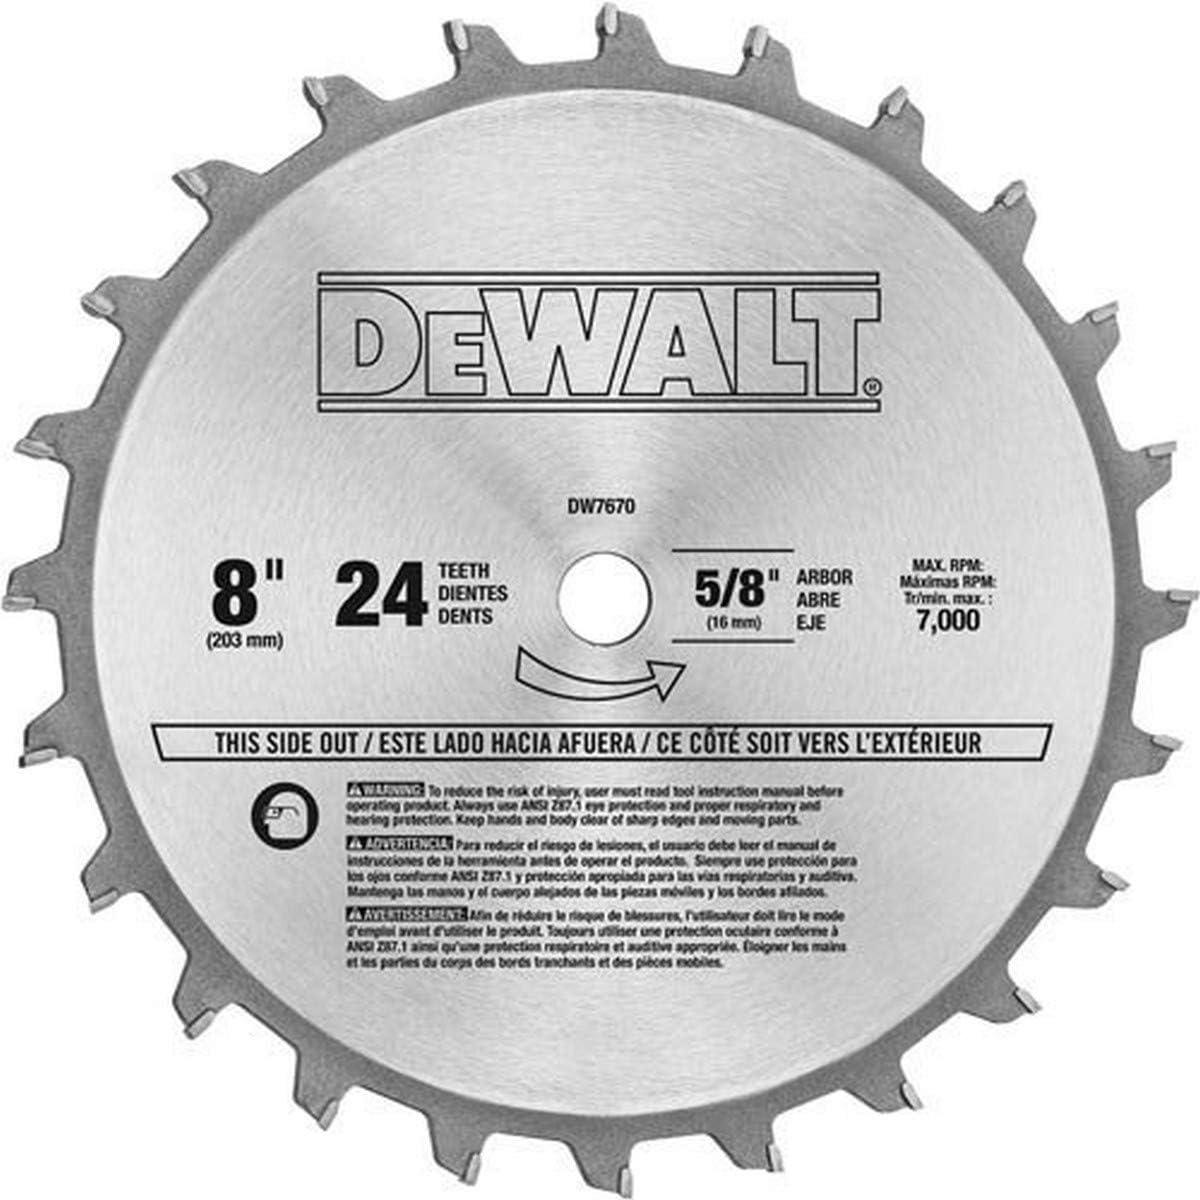 DEWALT DW7670 Stacked Dado Blade Set